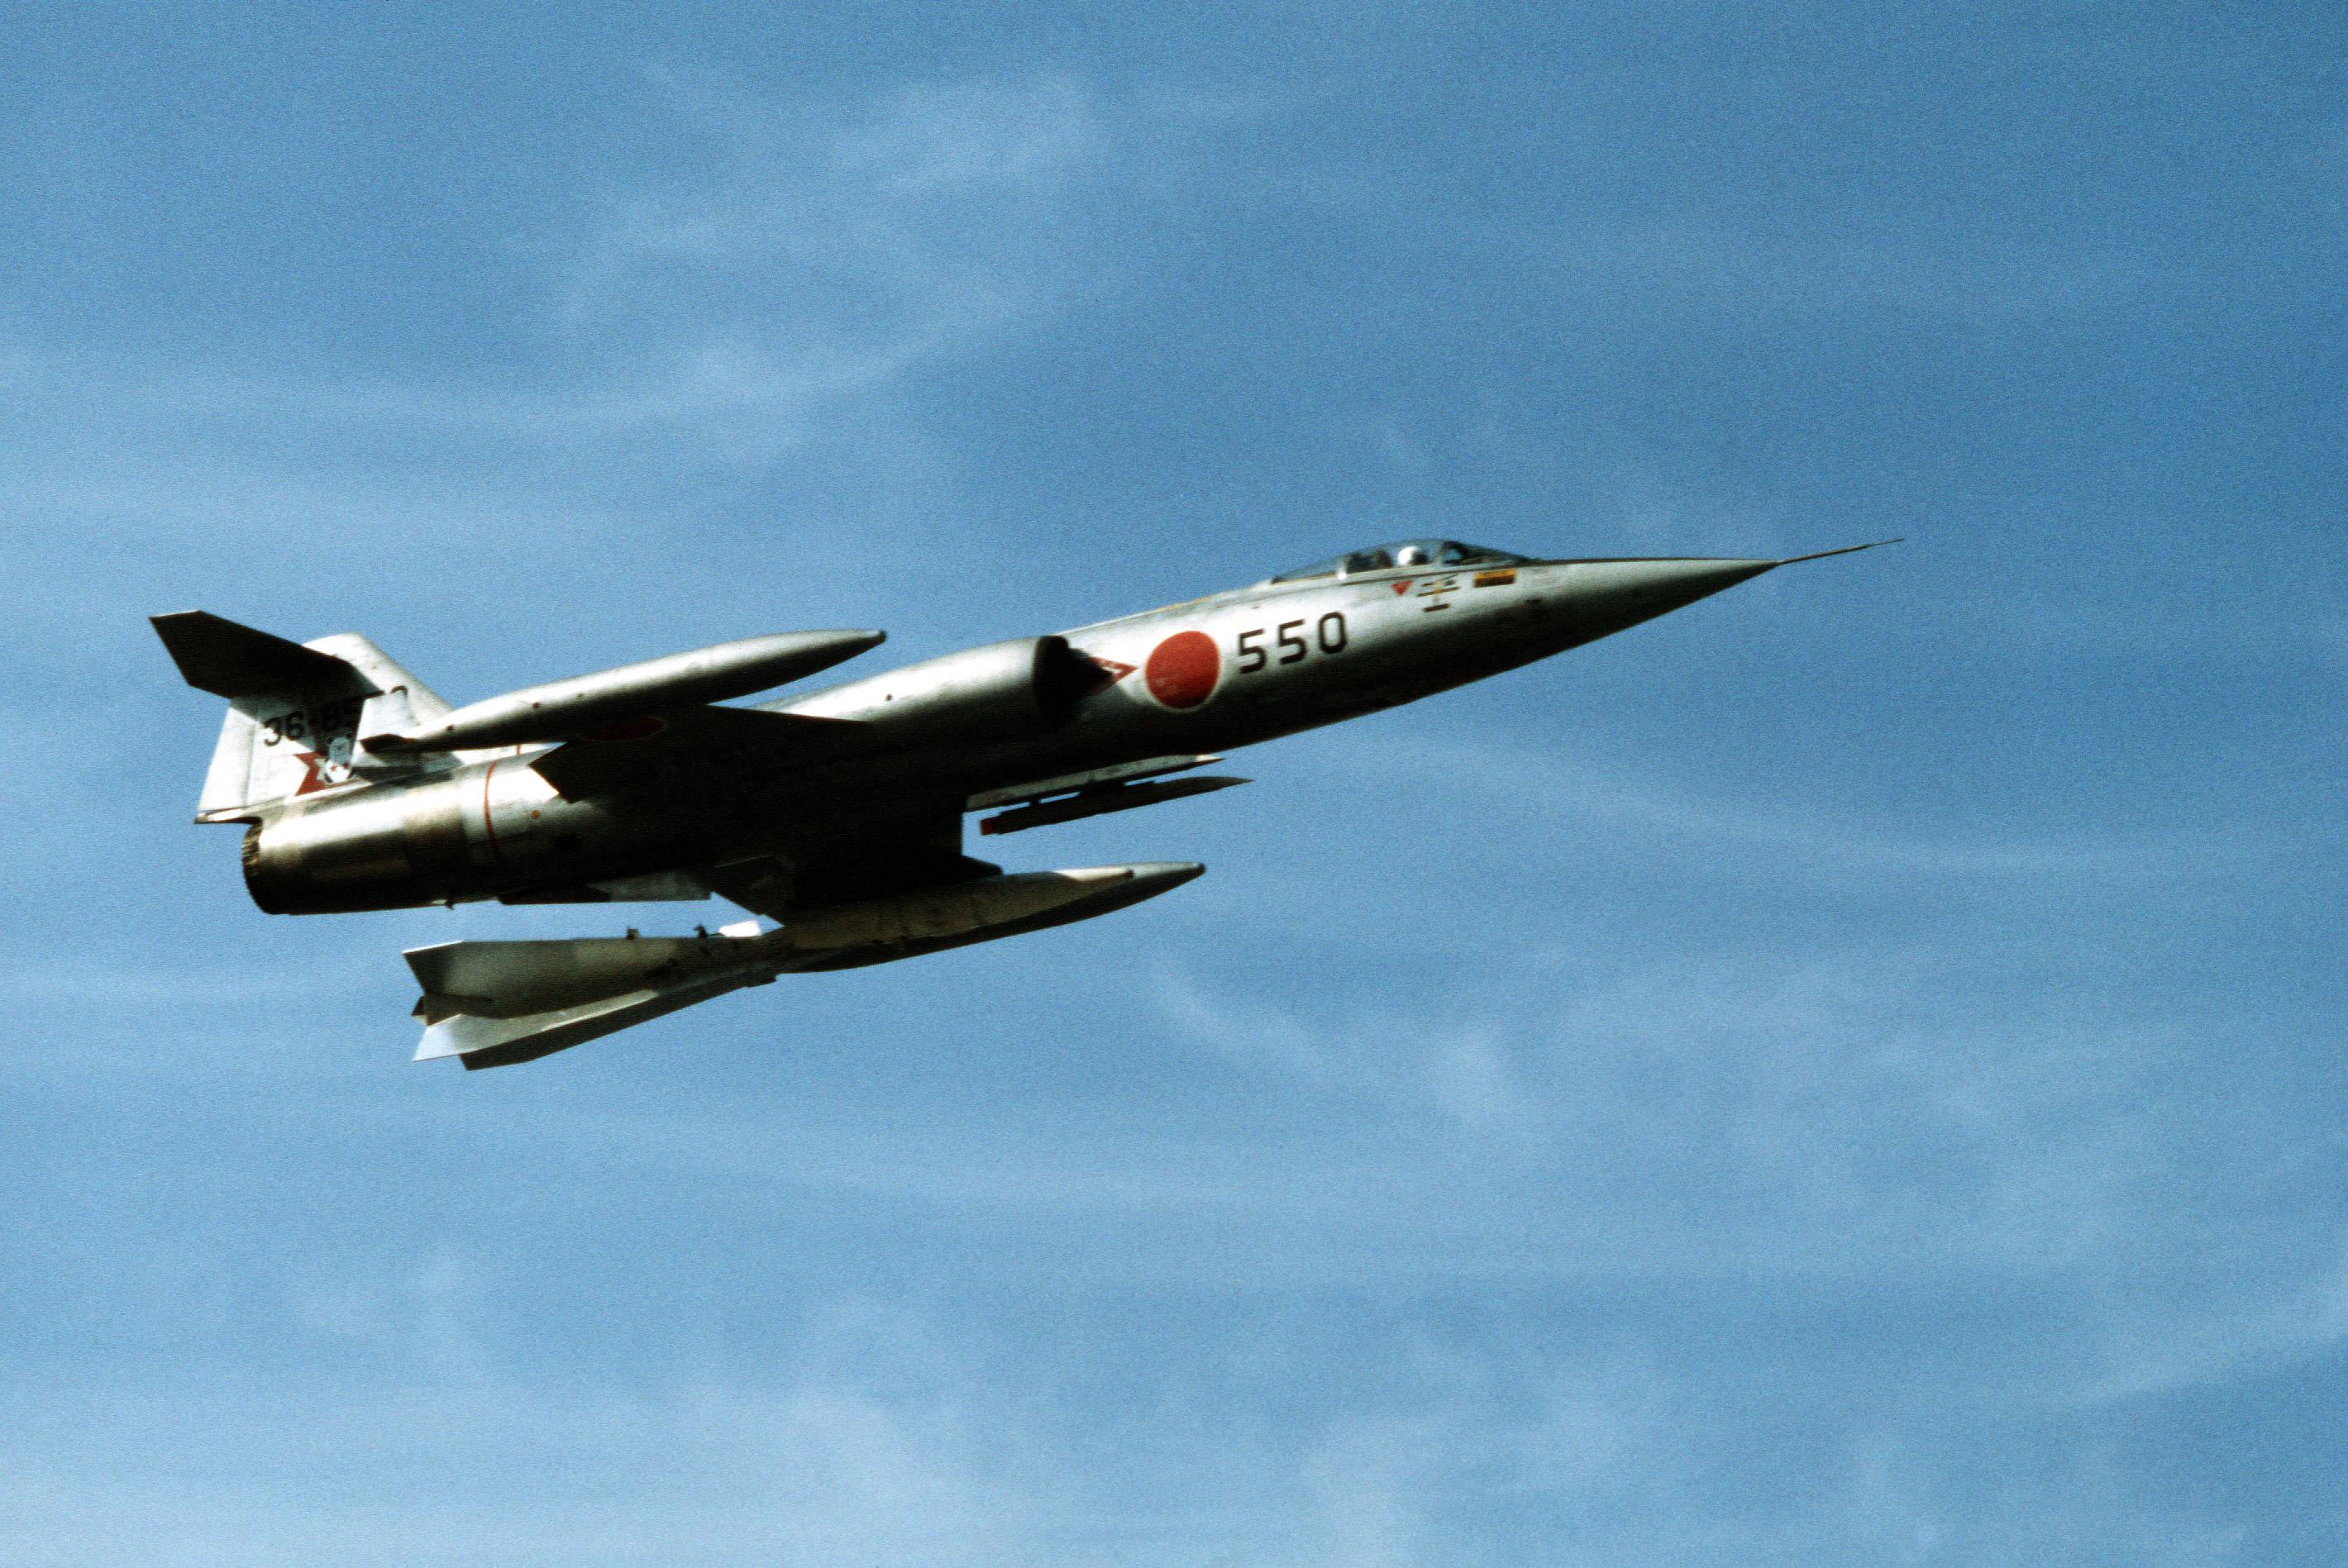 F 104 (戦闘機)の画像 p1_33